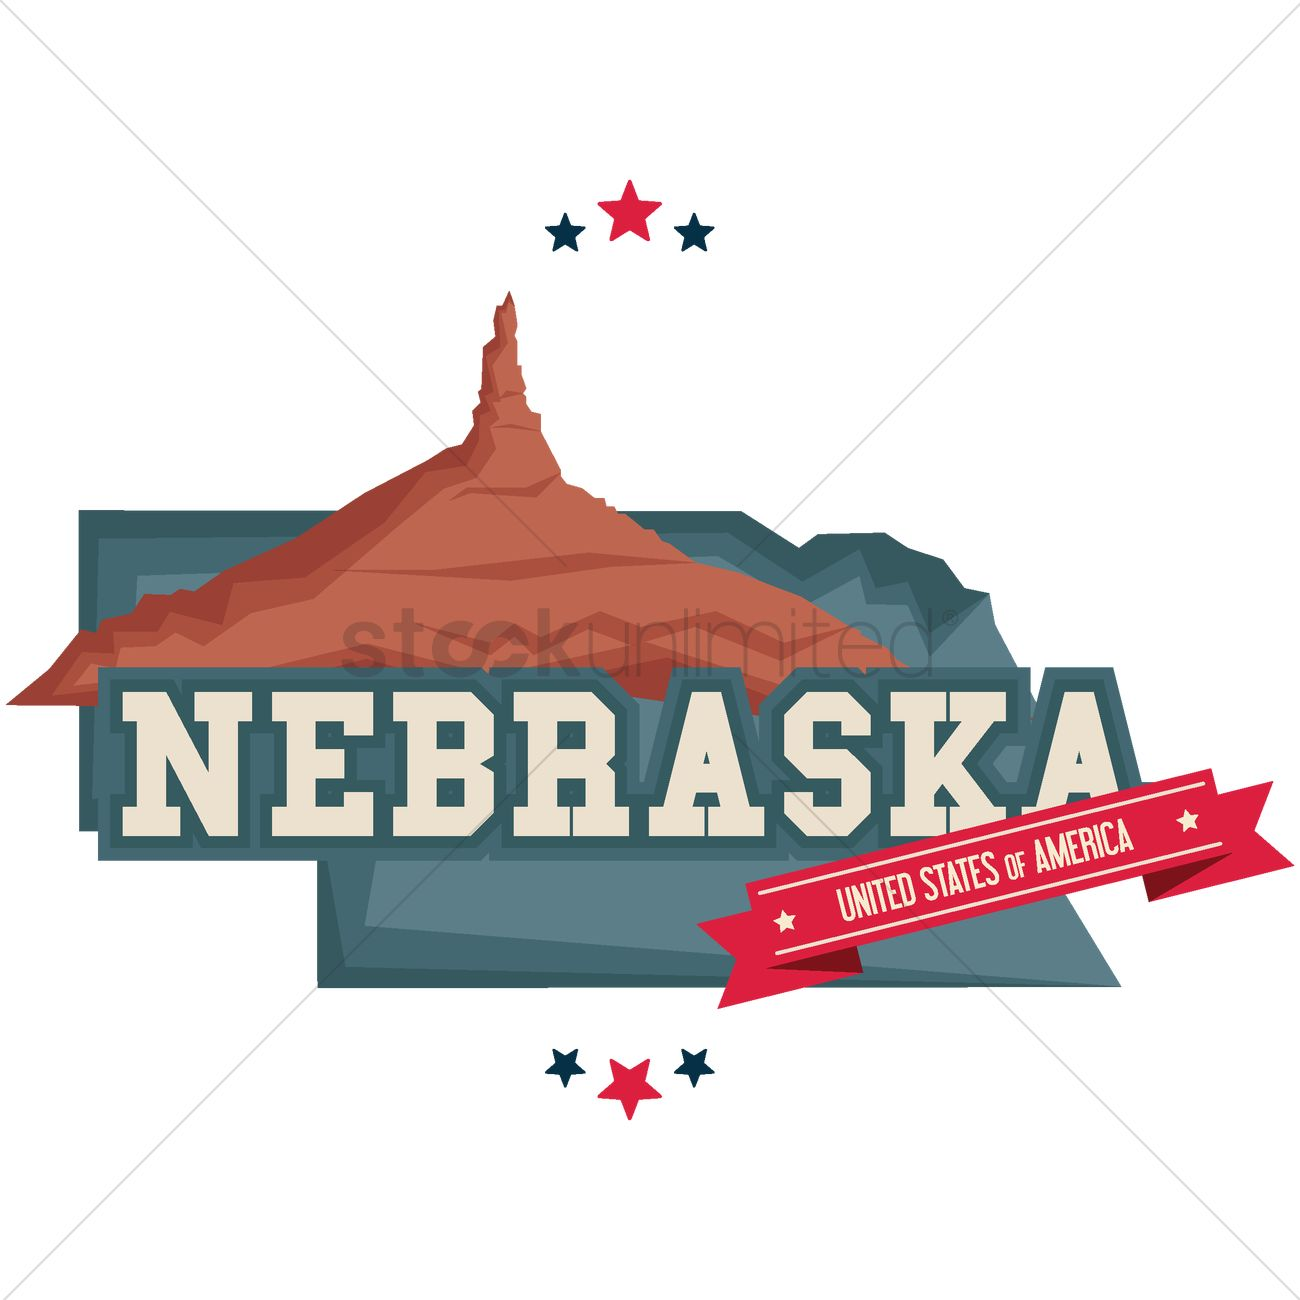 Nebraska Map With Chimney Rock Vector Image  1541155